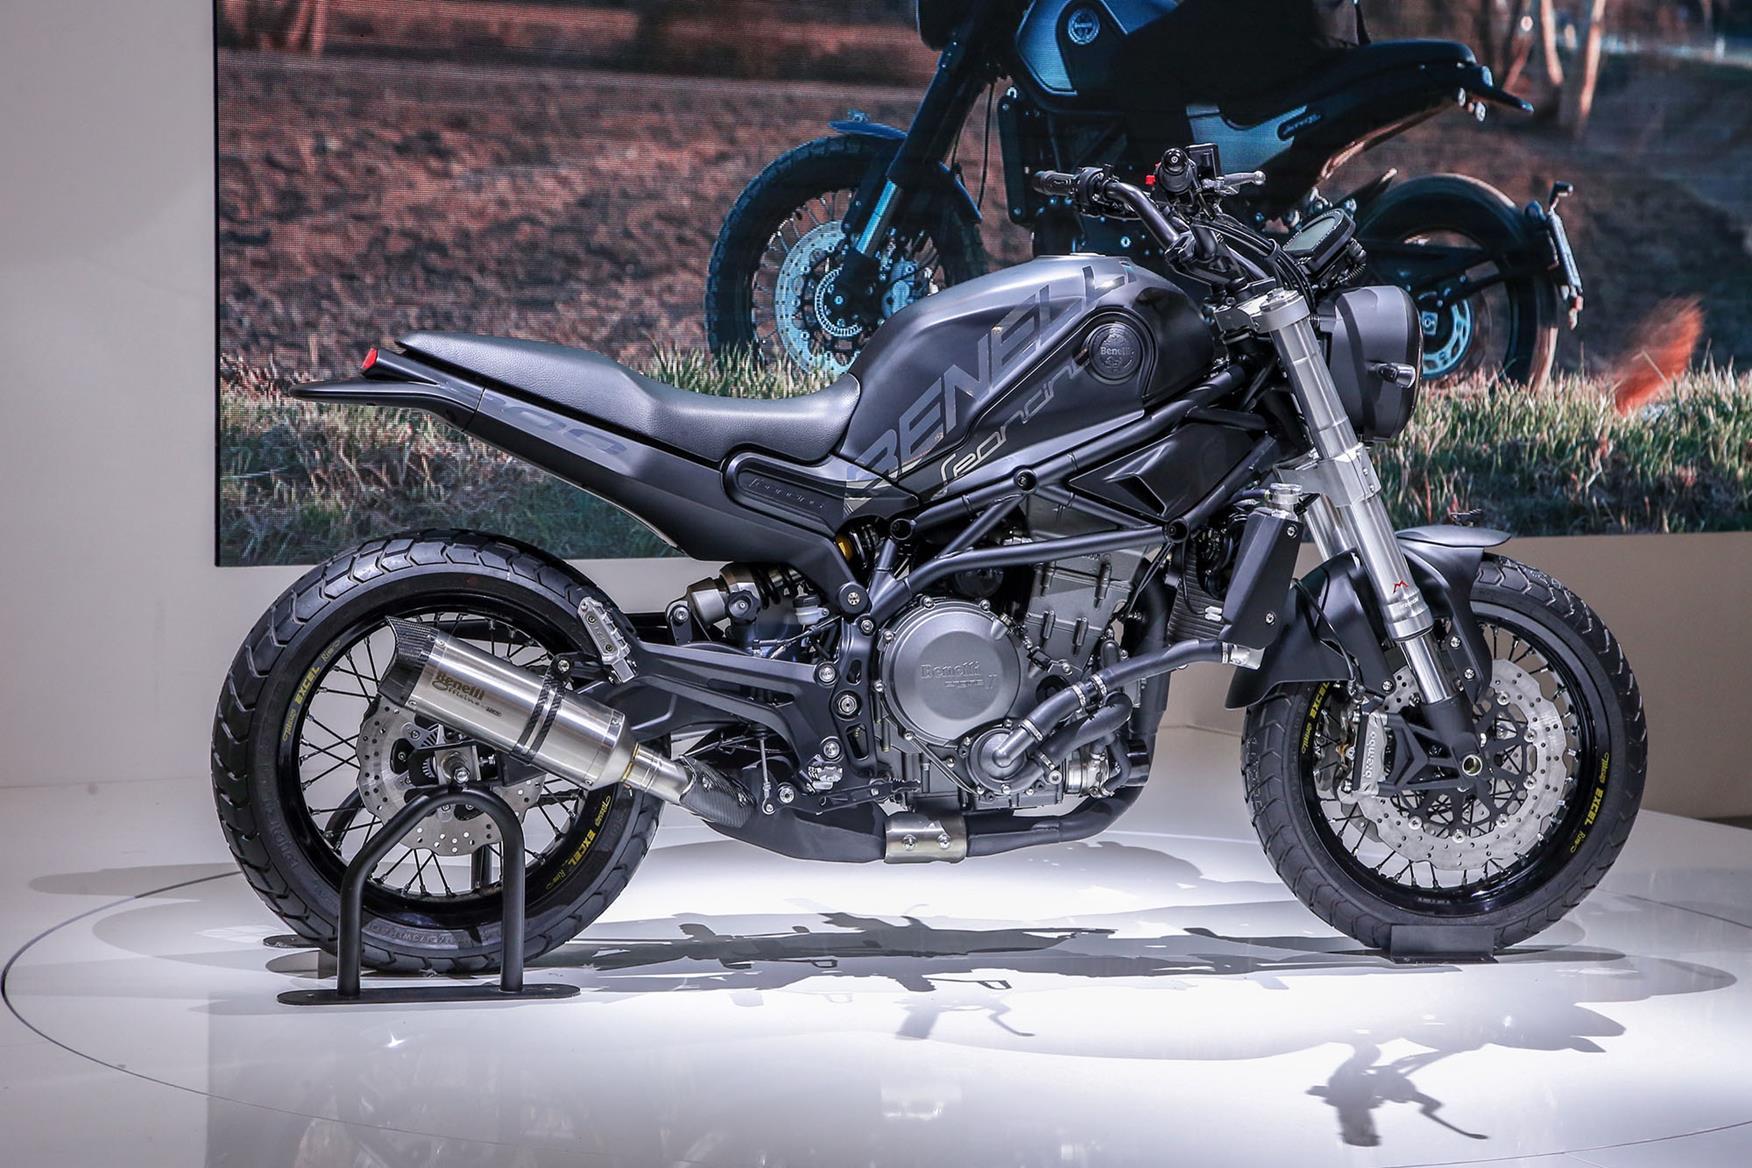 Benelli Leoncino 800 concept revealed at Eicma 2018